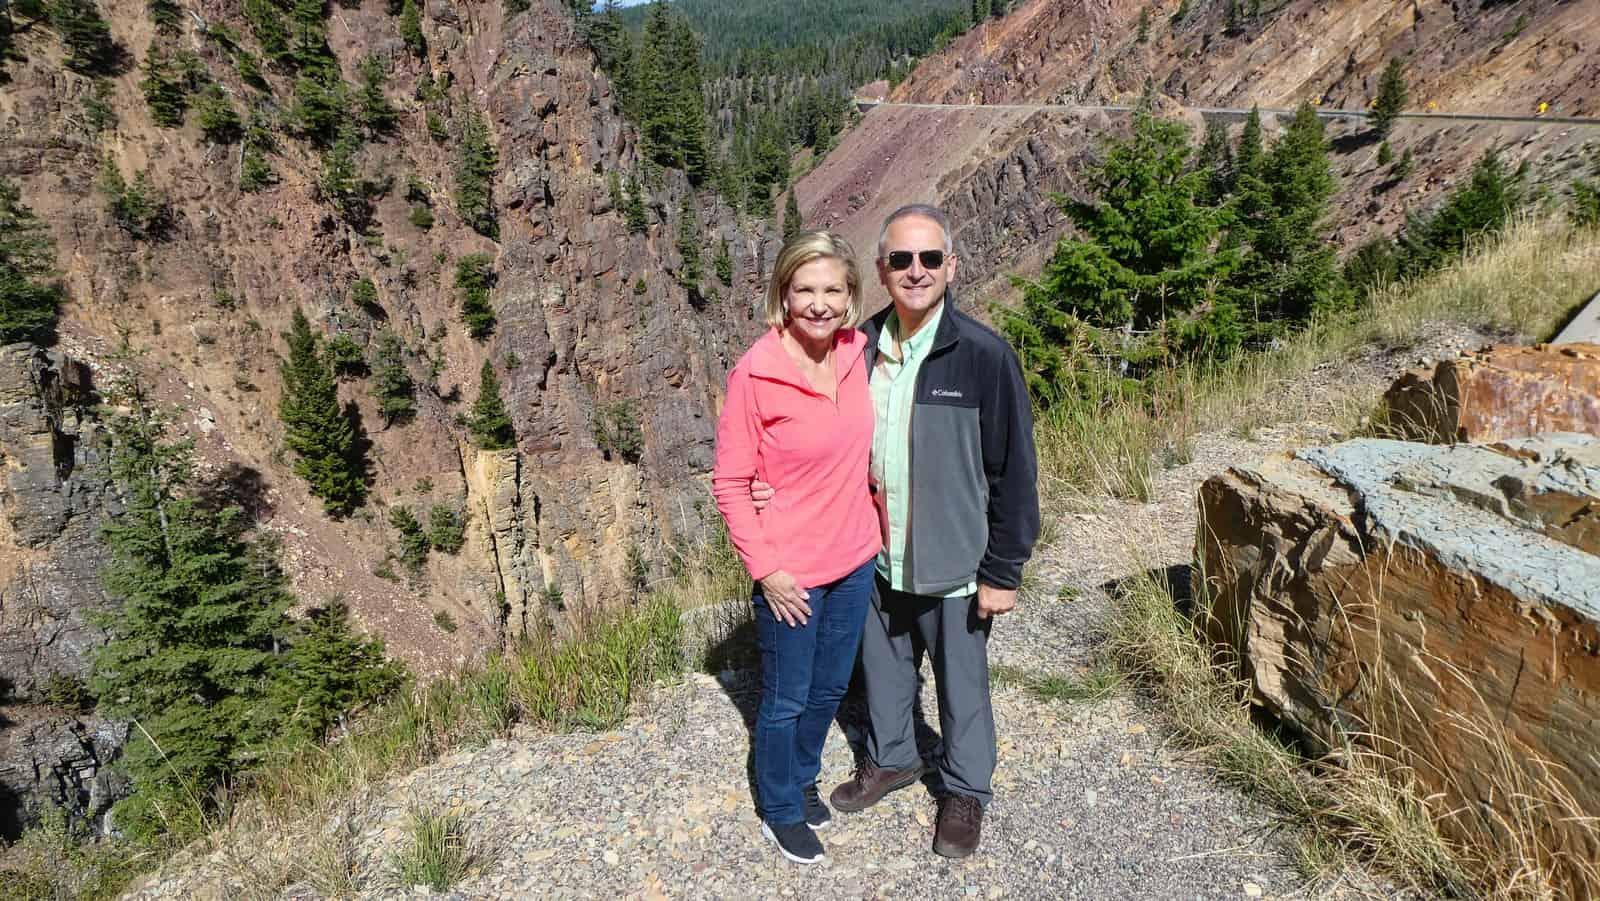 Granite State Park